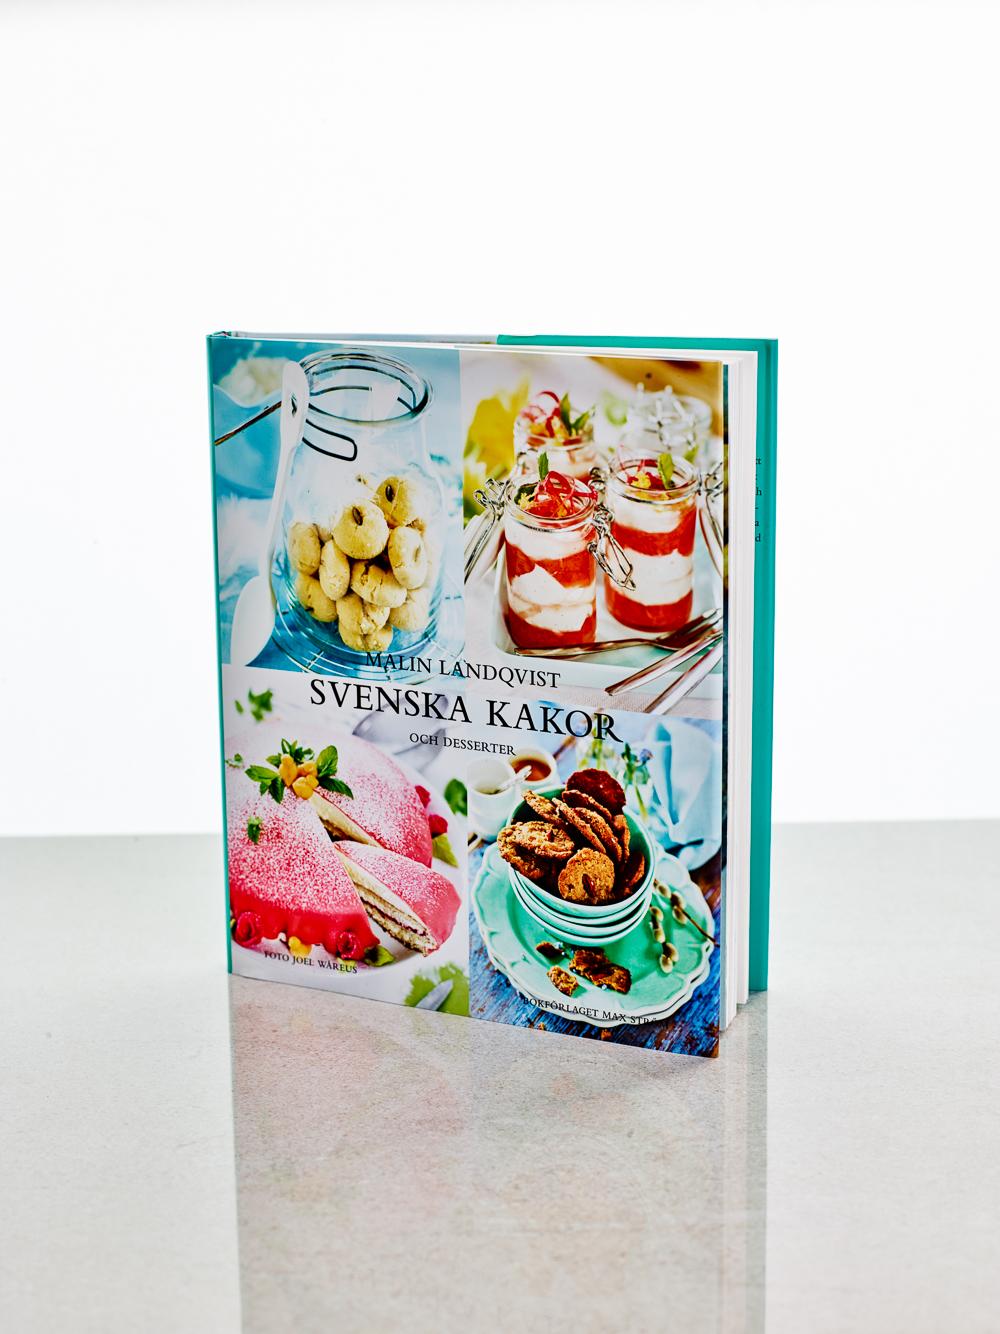 Svenska kakor & desserter